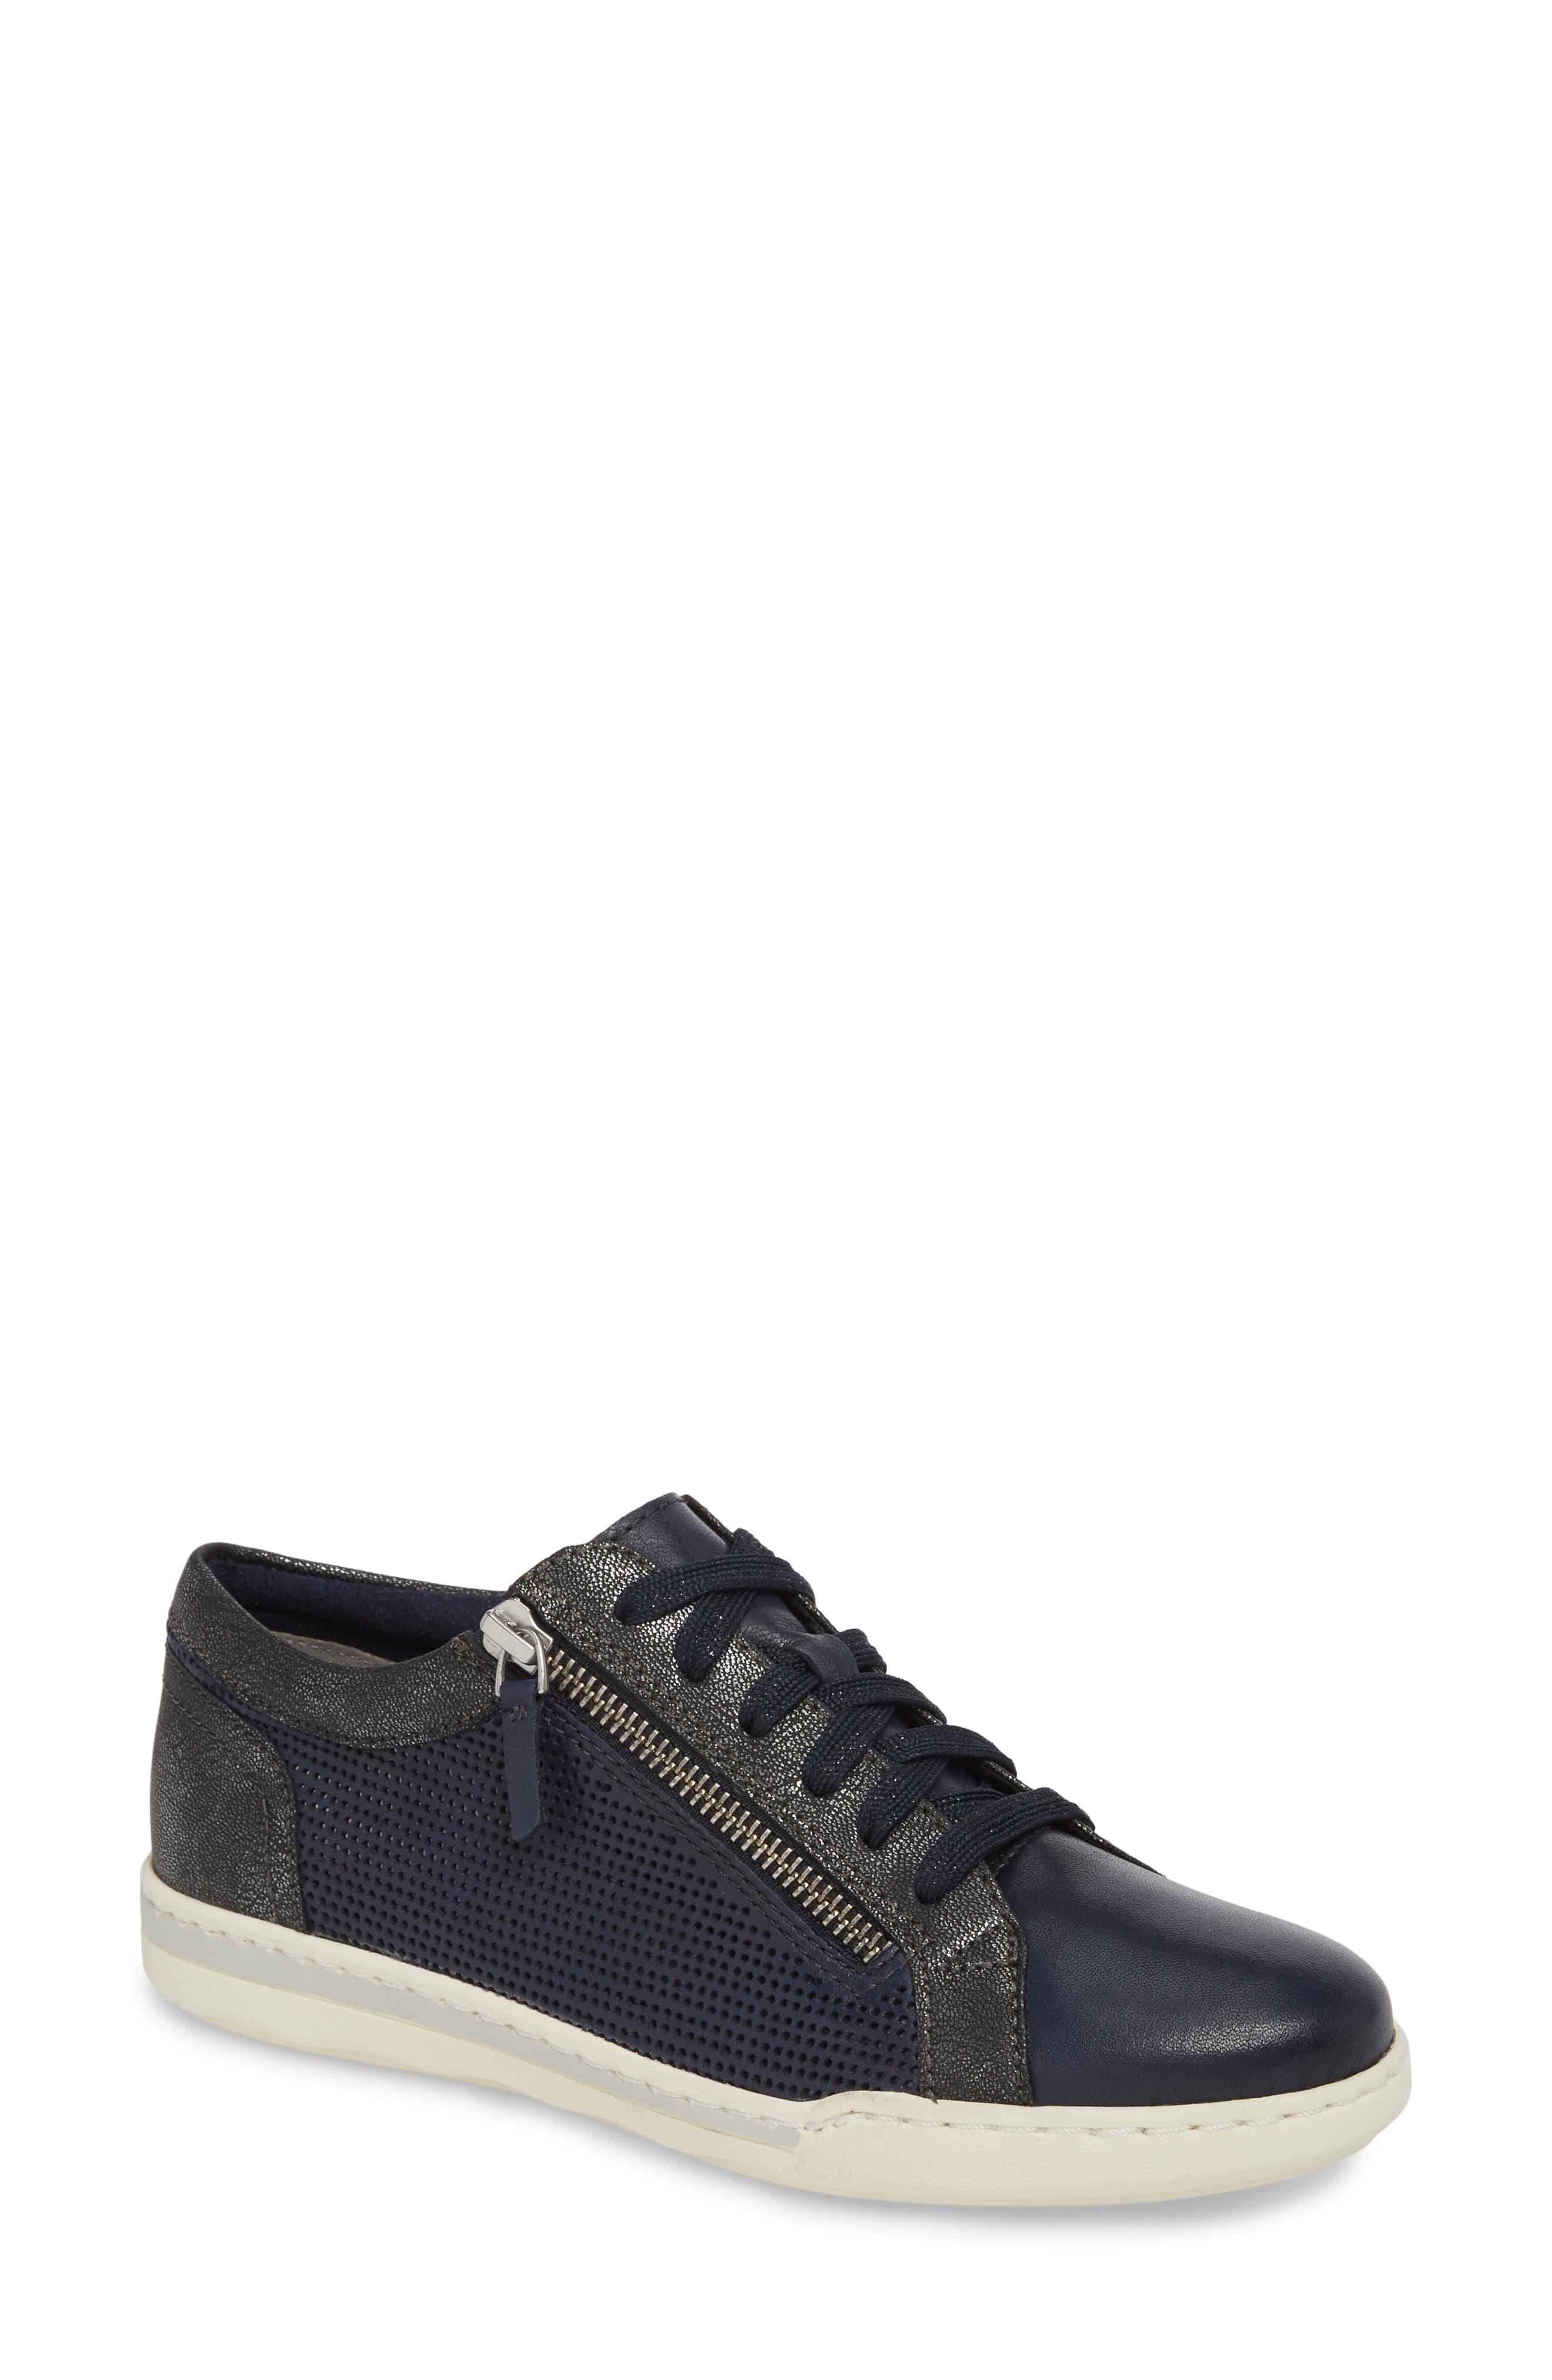 Freya Sneaker,                             Main thumbnail 1, color,                             Navy Leather